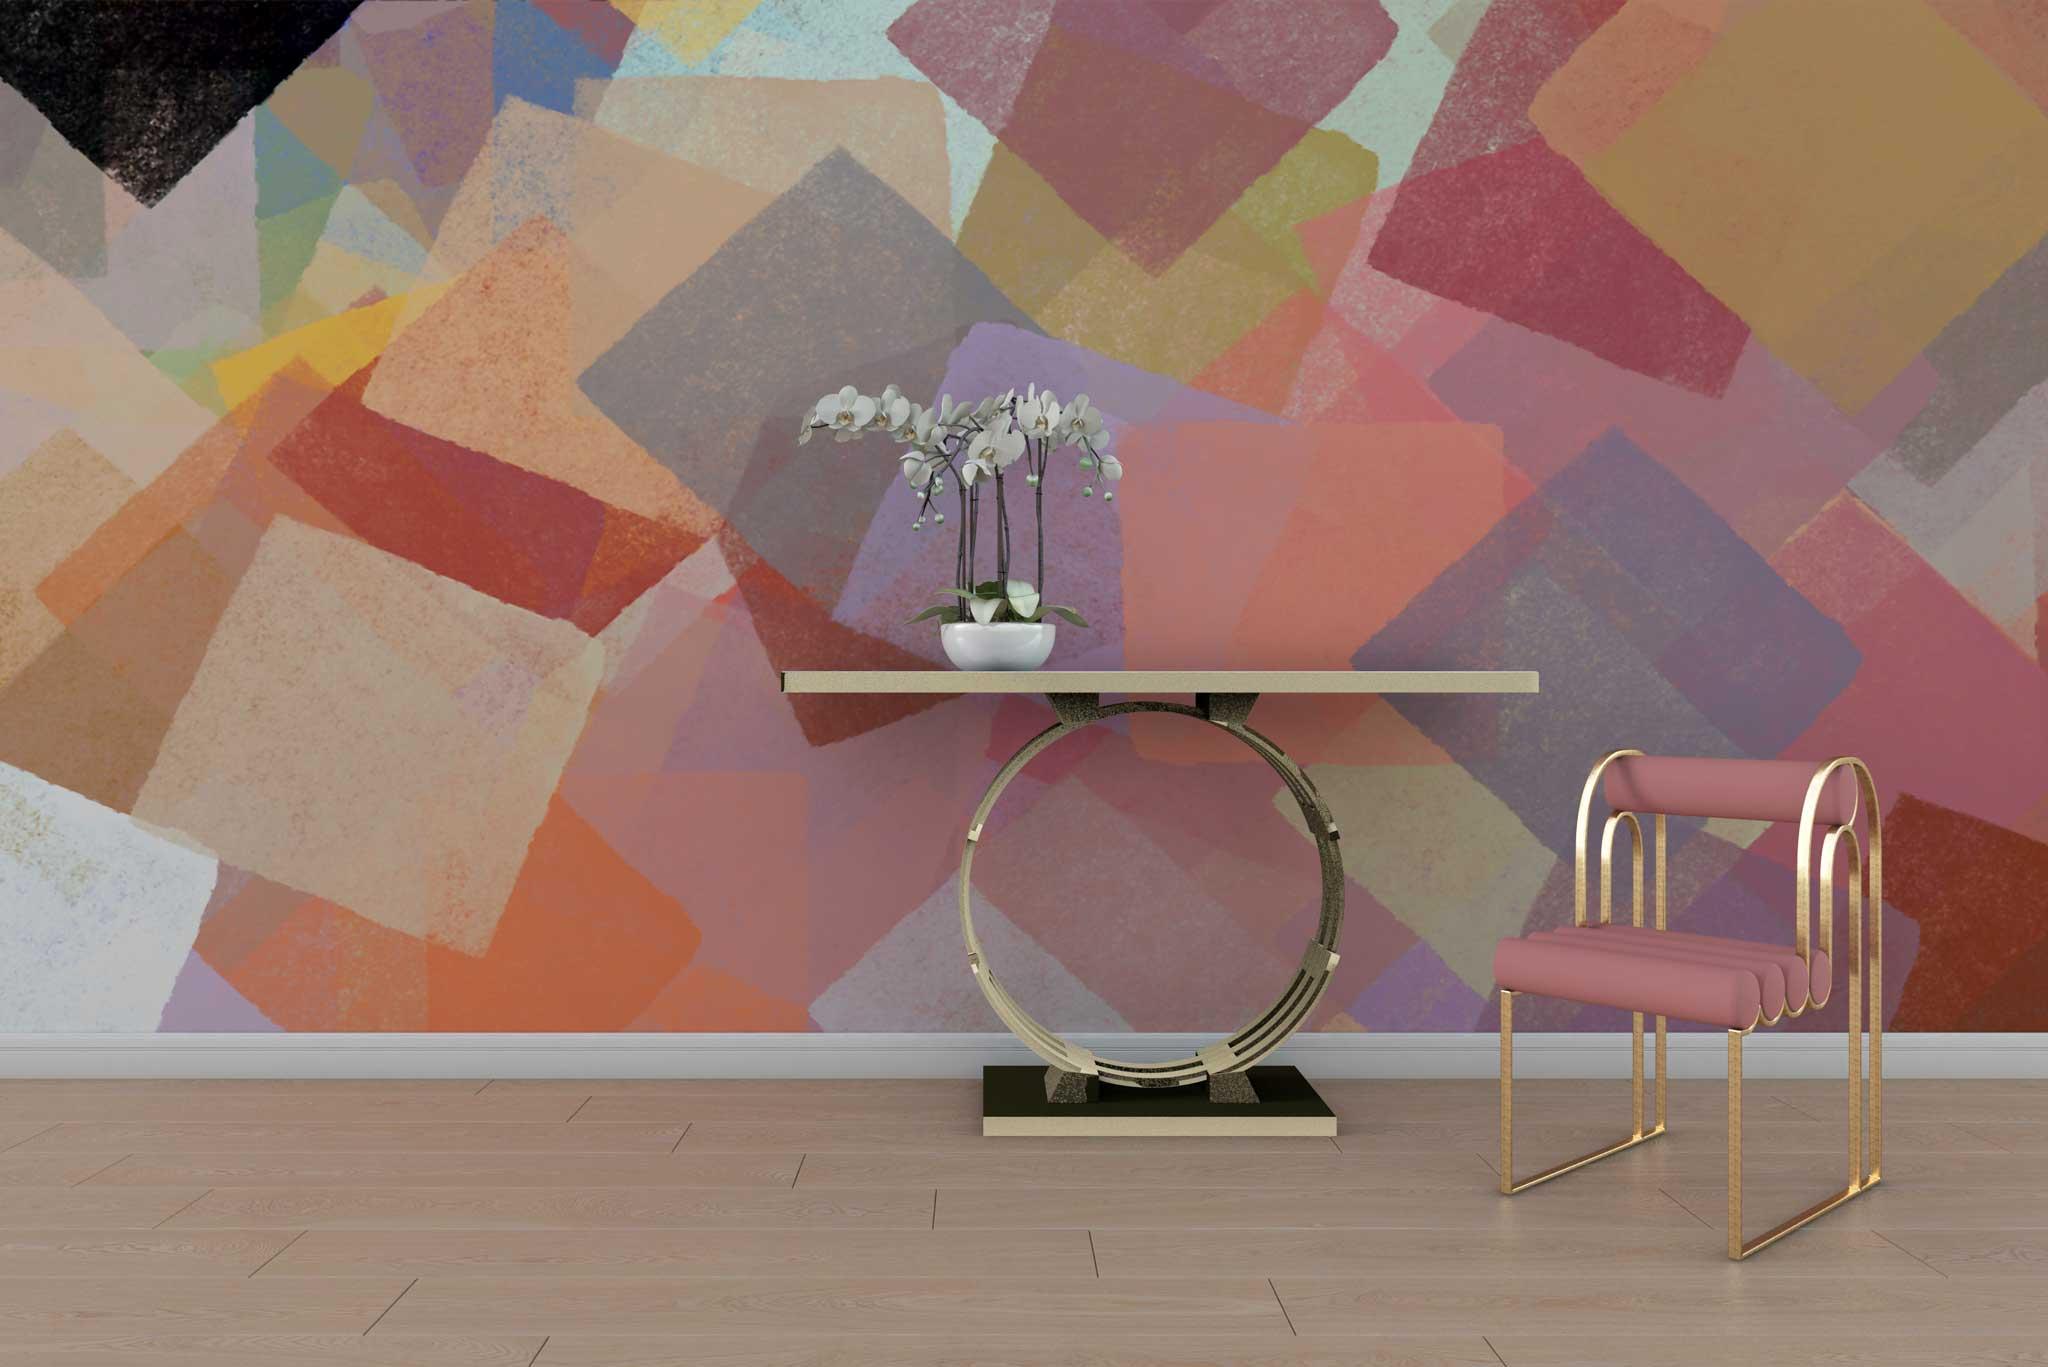 http://daringprints.ro/wp-content/uploads/2020/12/tapet-fototapet-design-interior-personalizat-comanda-special-bucuresti-motiv-geometric-grafic-multicolor-colorat-patrate-1.jpg